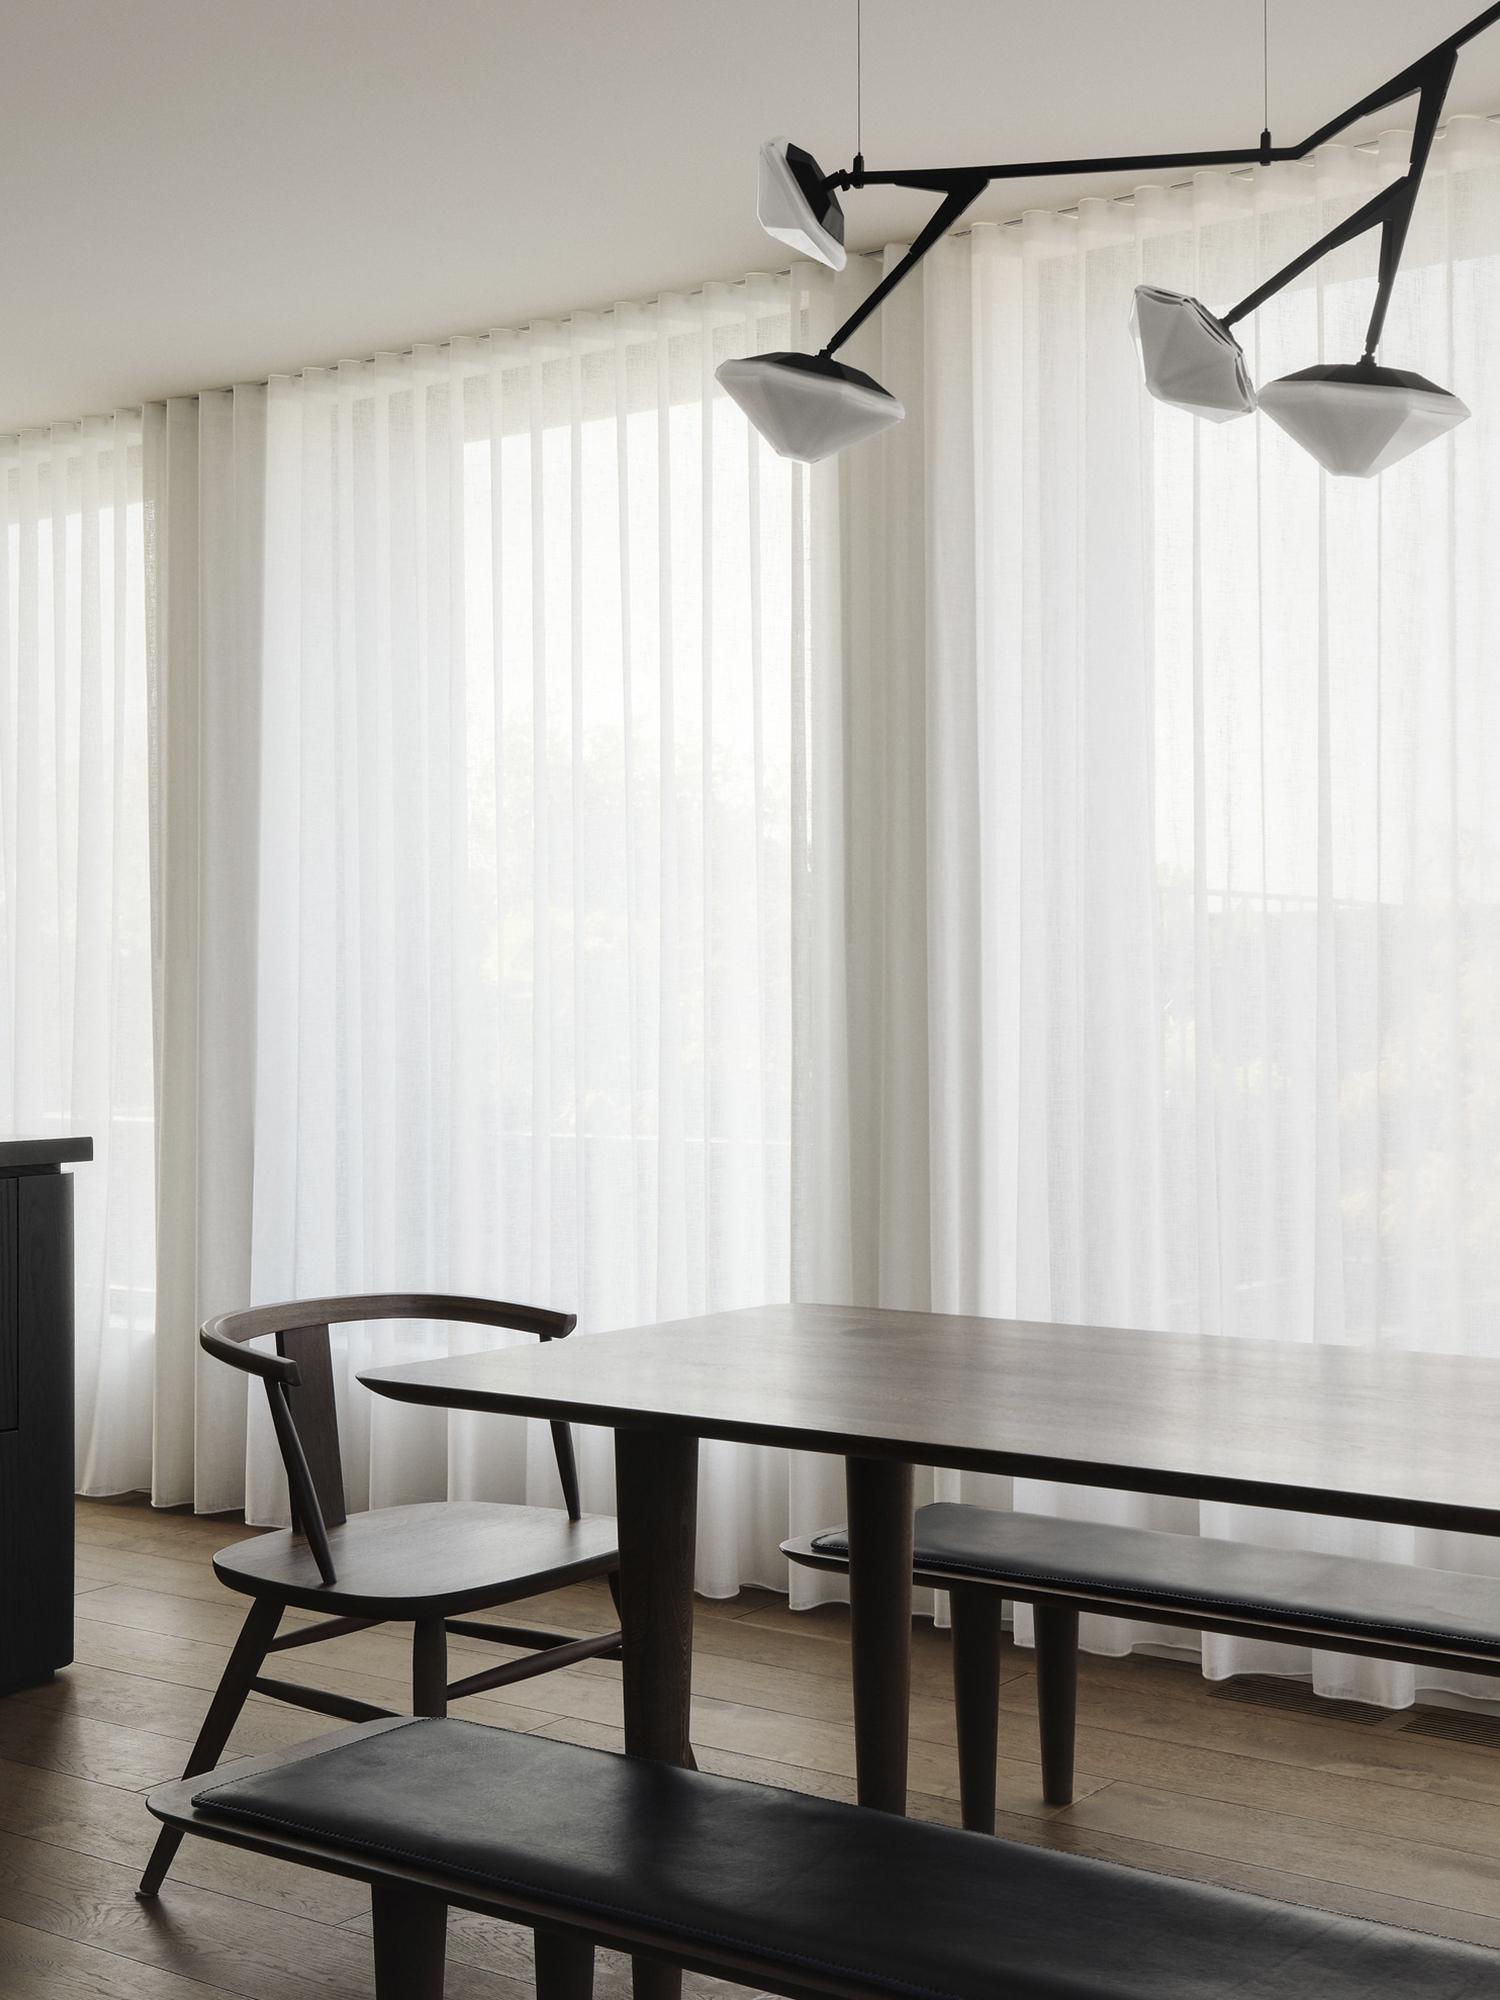 est living Alma House Atelier Barda Architects 18